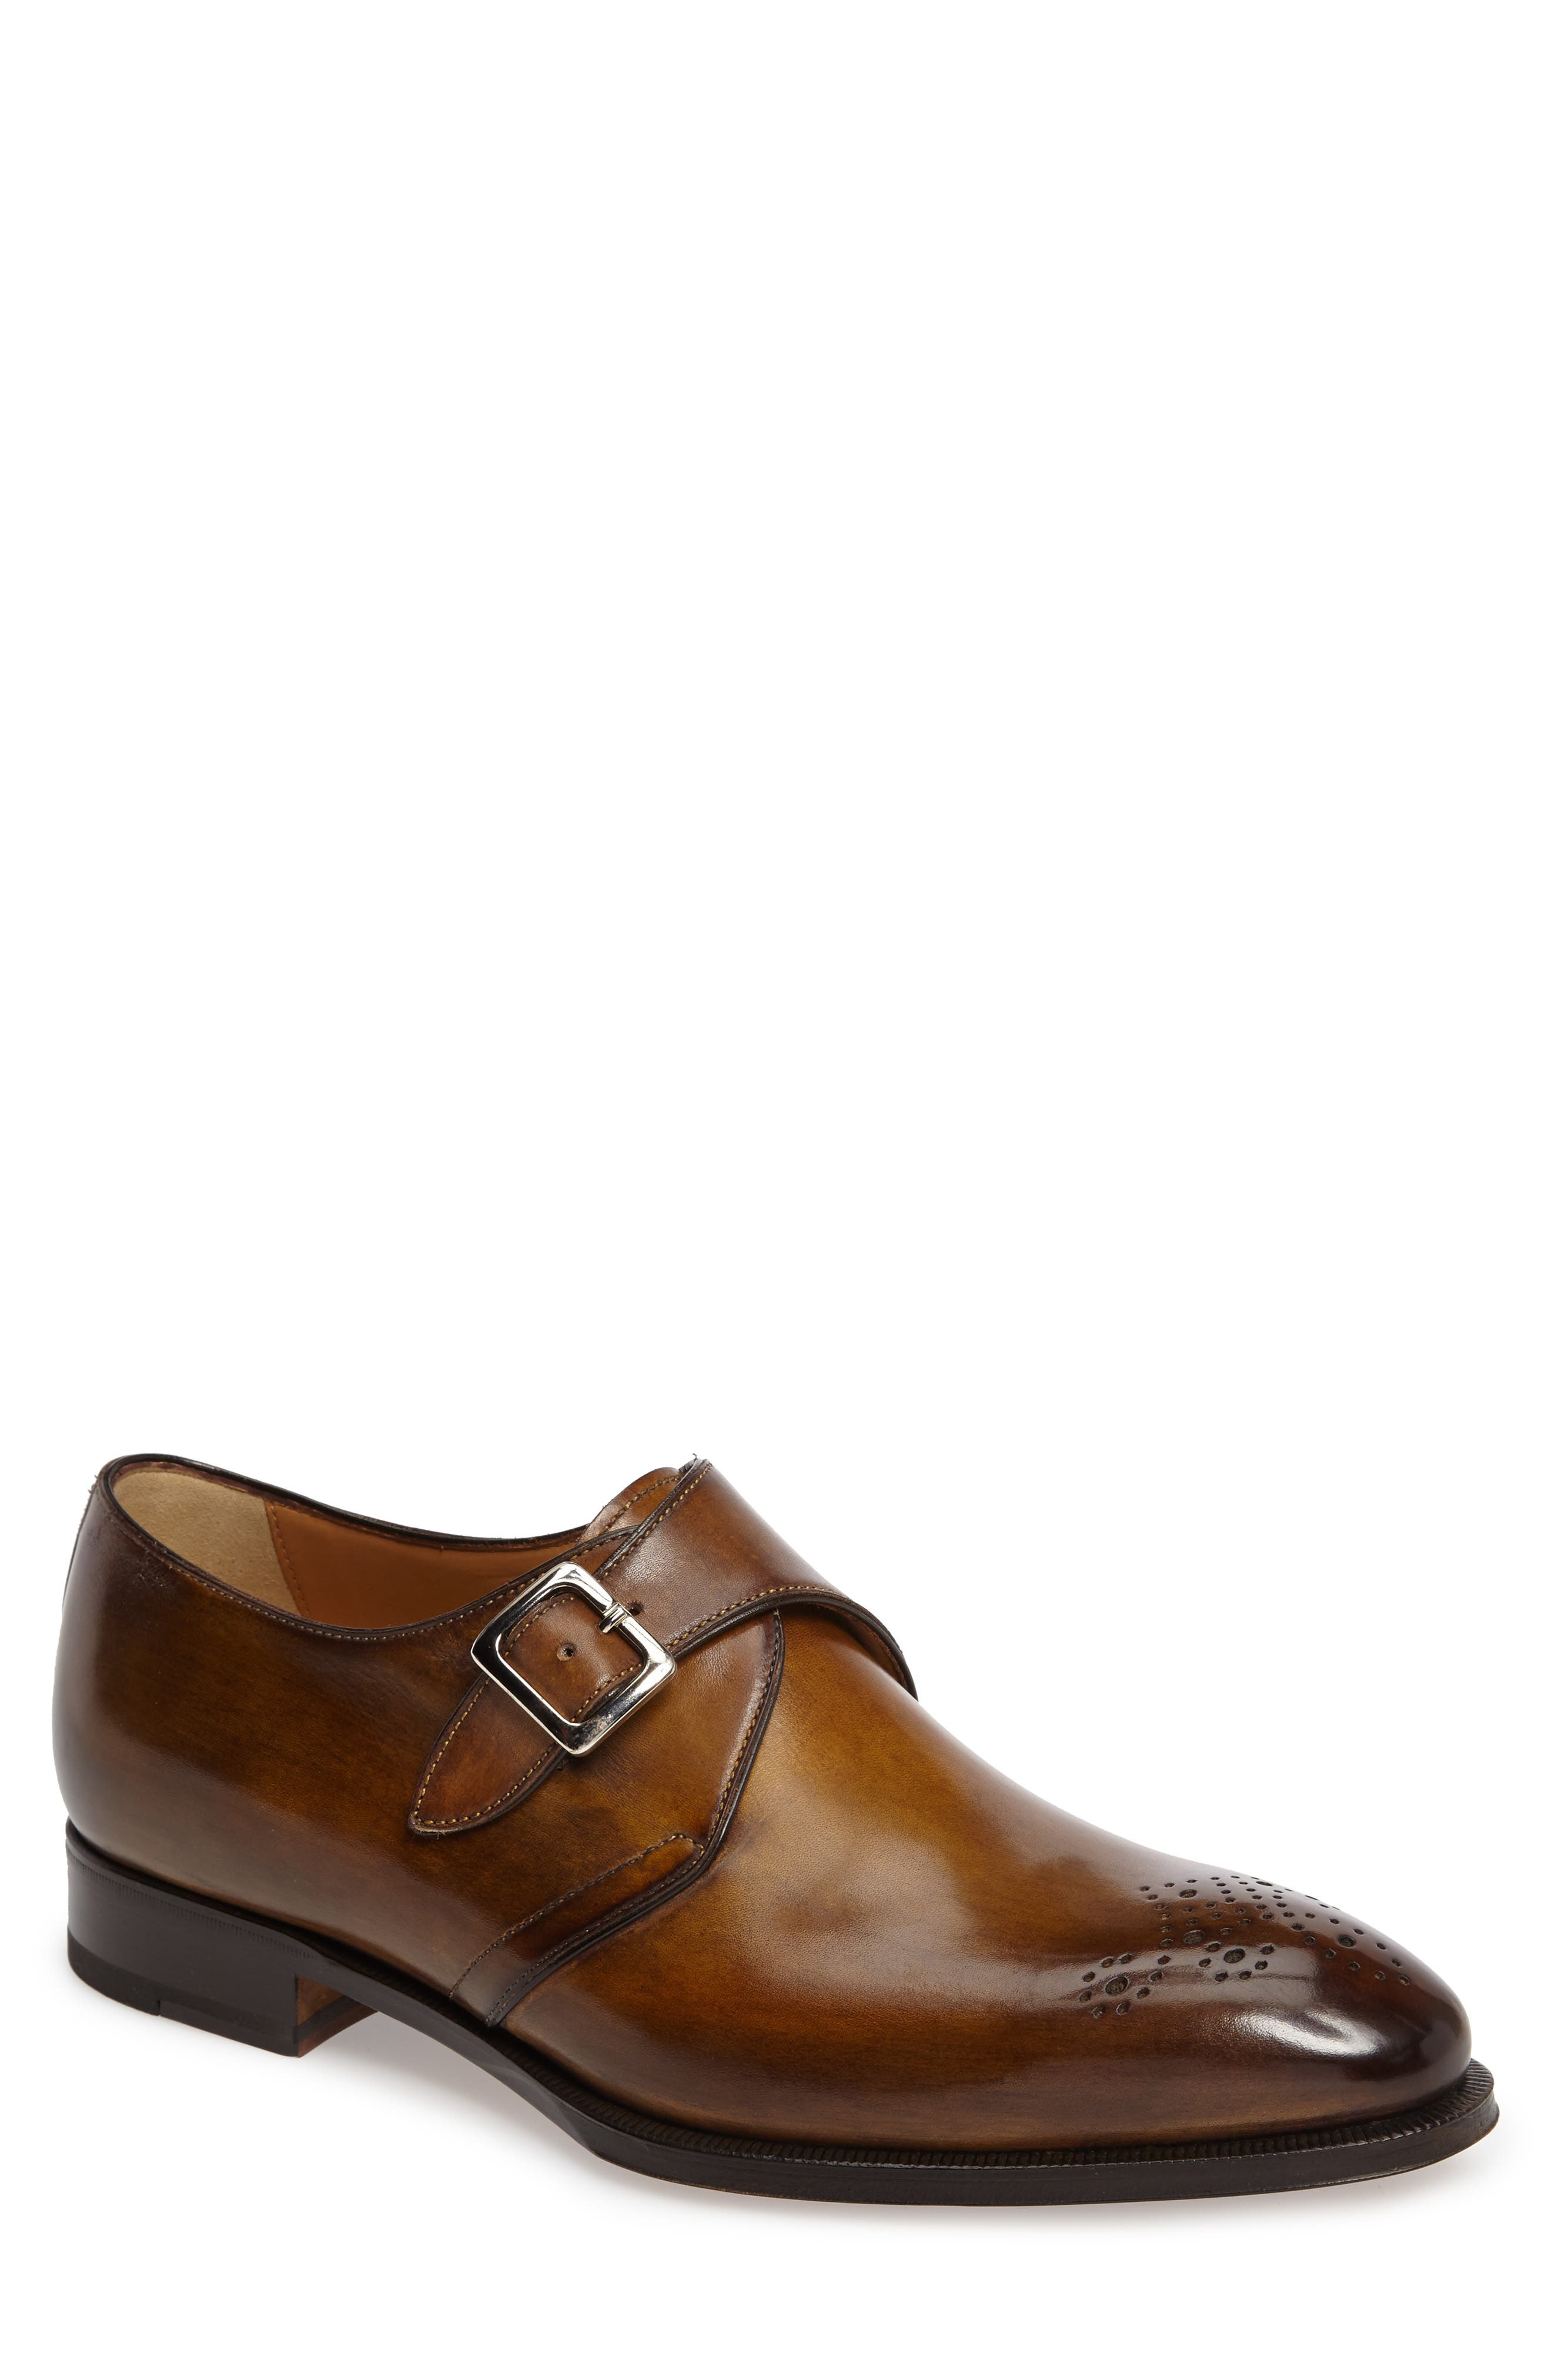 Blake Monk Strap Shoe,                         Main,                         color, Reverse Sombrero